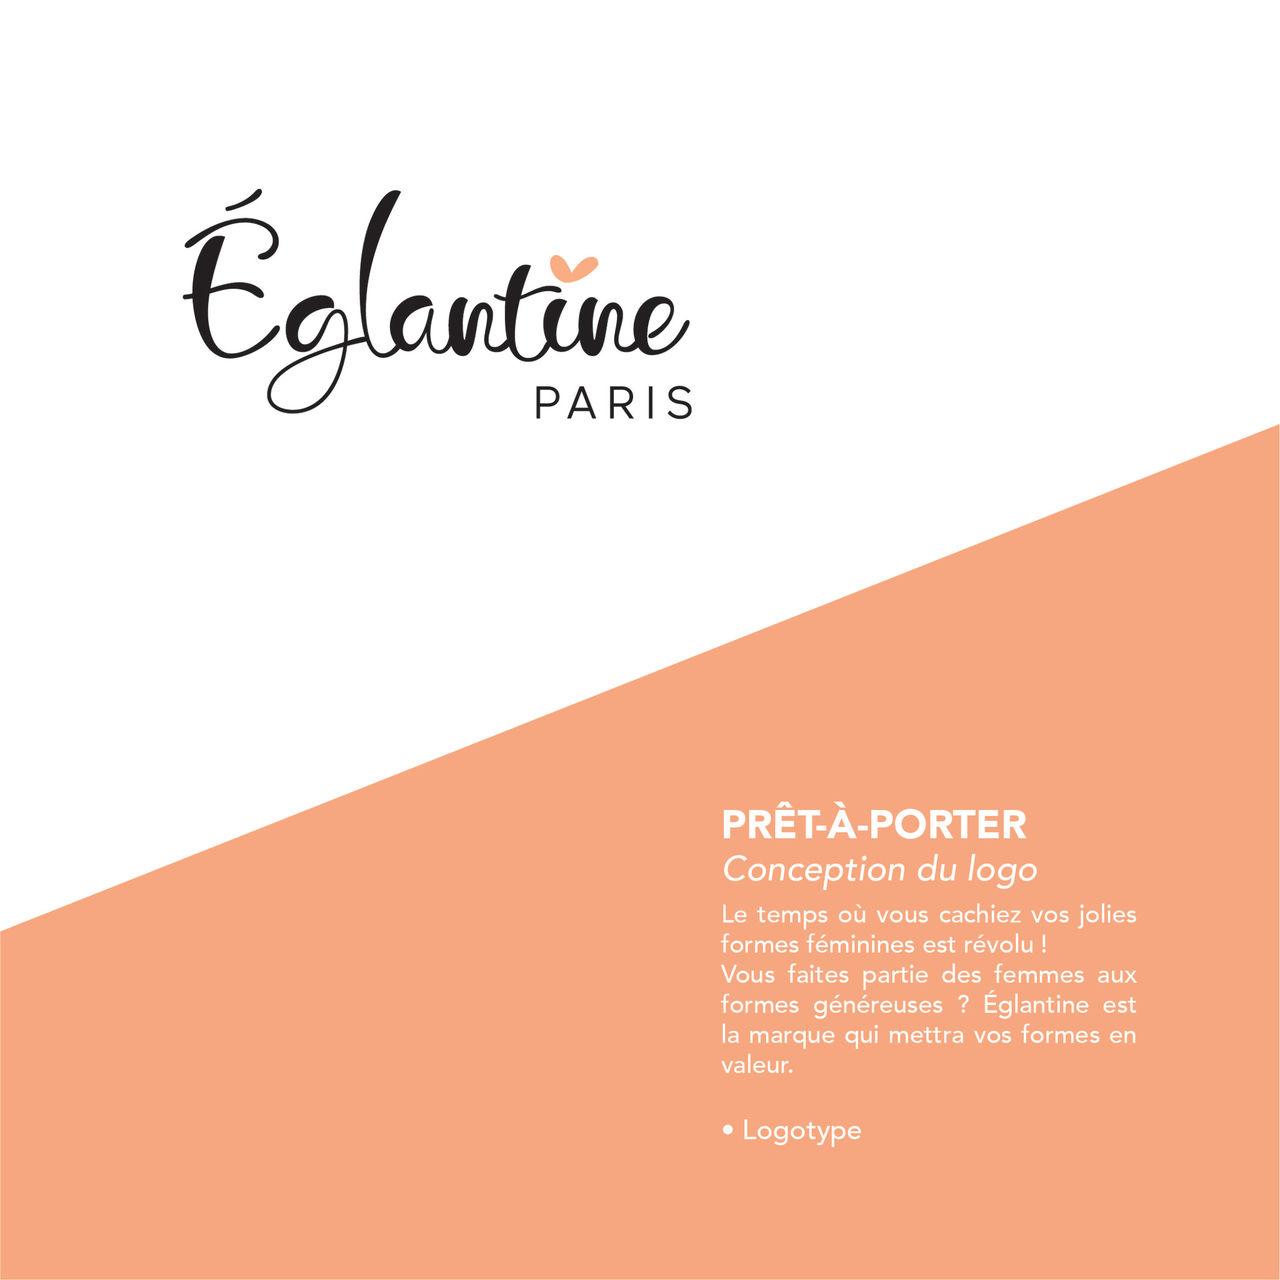 Eglantine_Concept